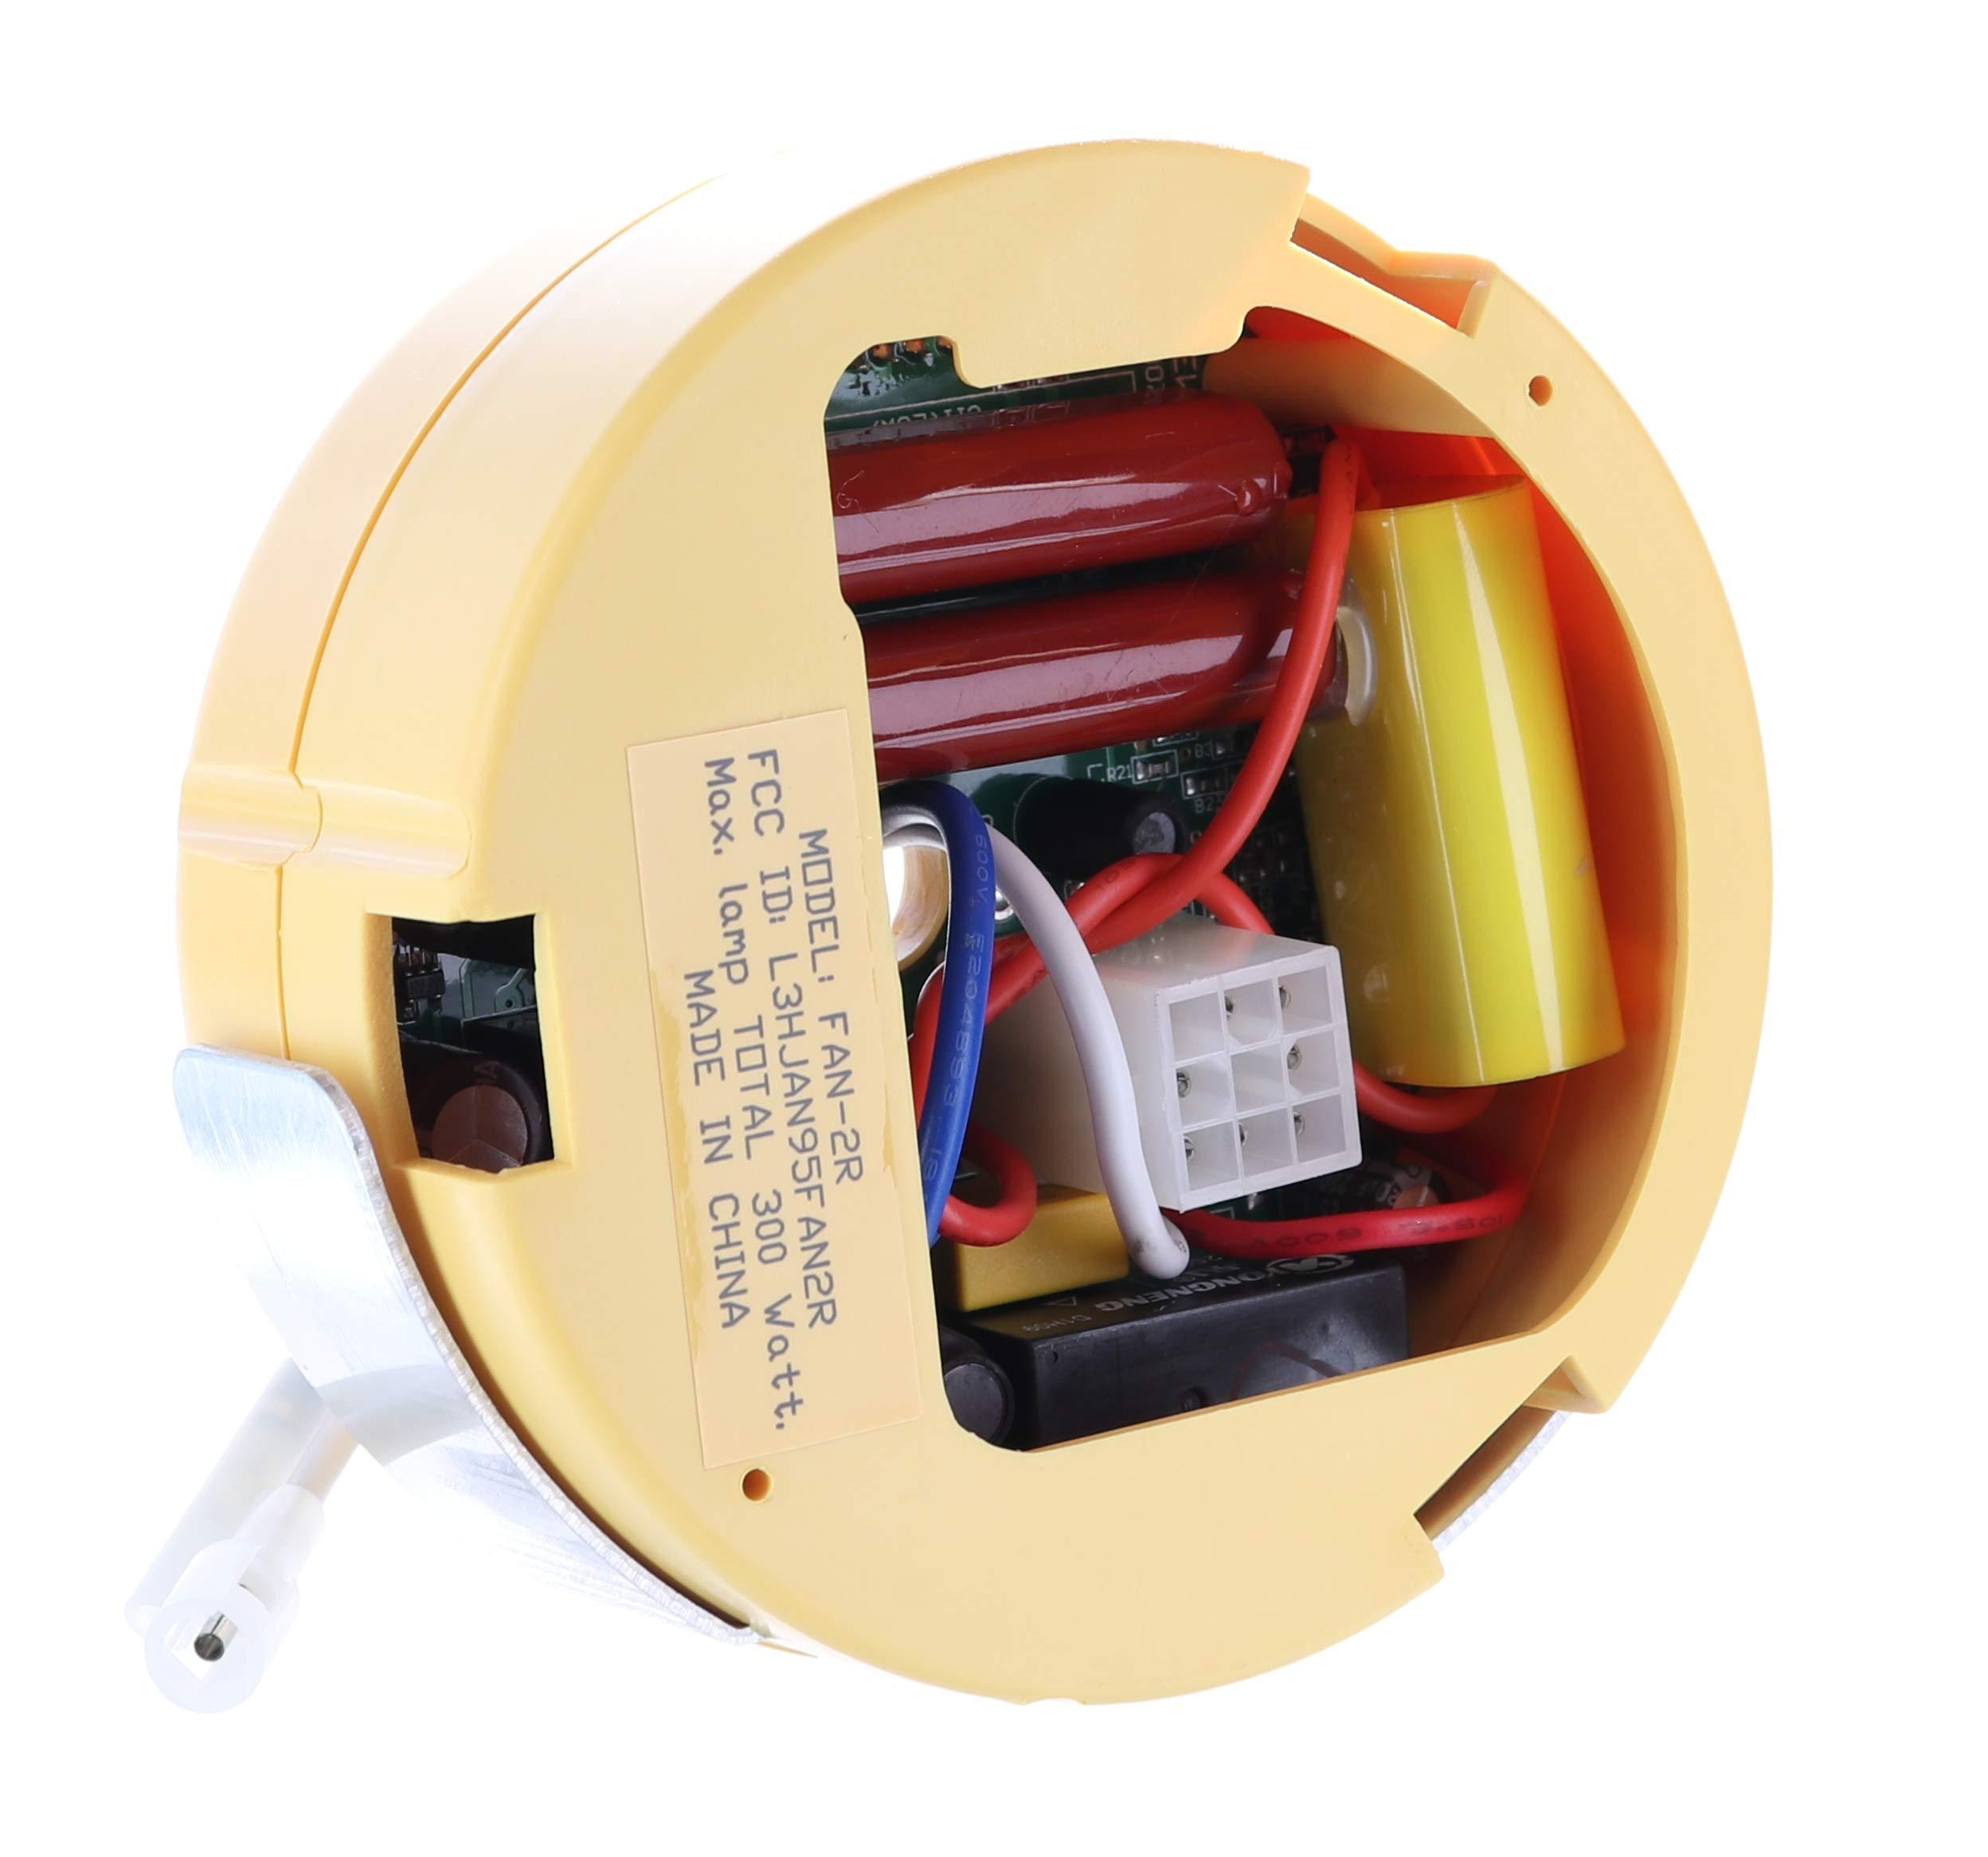 Ceiling Fan Remote Control of Replacement for Hampton Bay Hunter FAN-HD UC7078T CHQ7078T FAN-HD5 Standard-RR7079T L3H2010 CFL LED FANHD